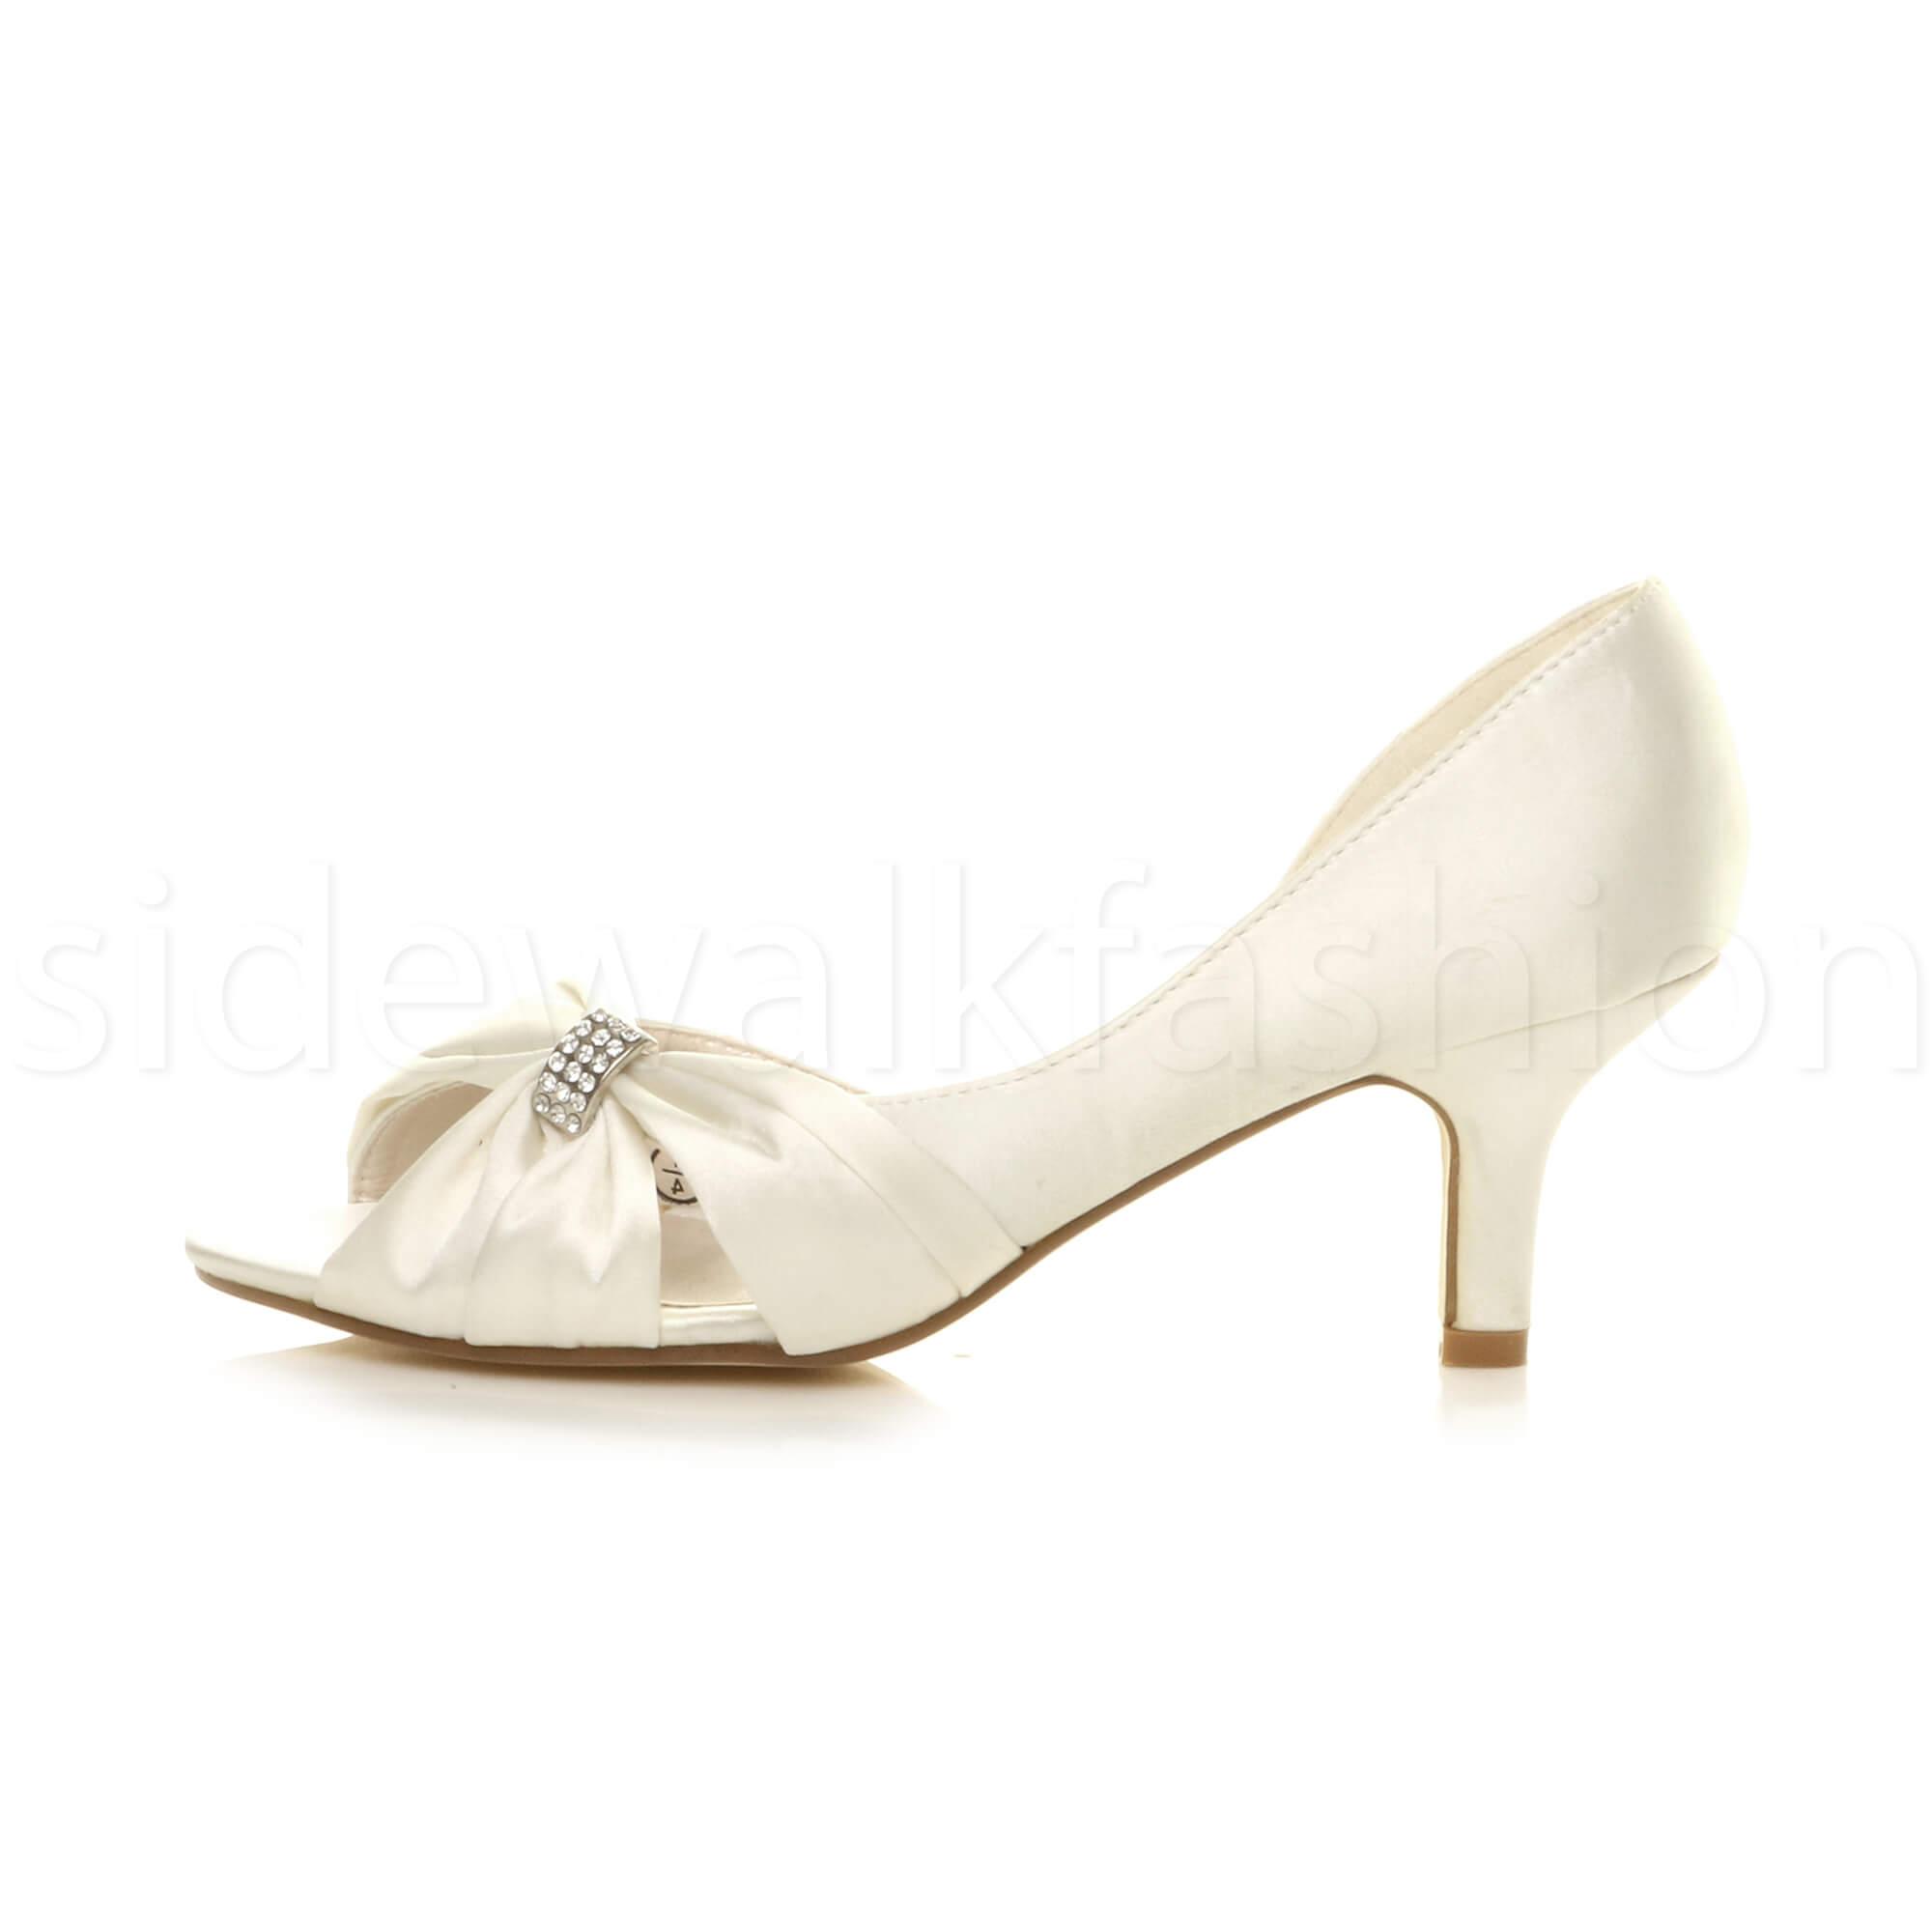 3c7a0bf5815a Womens Ladies Wedding Evening Low Kitten Heel Peeptoe Shoes Sandals ...